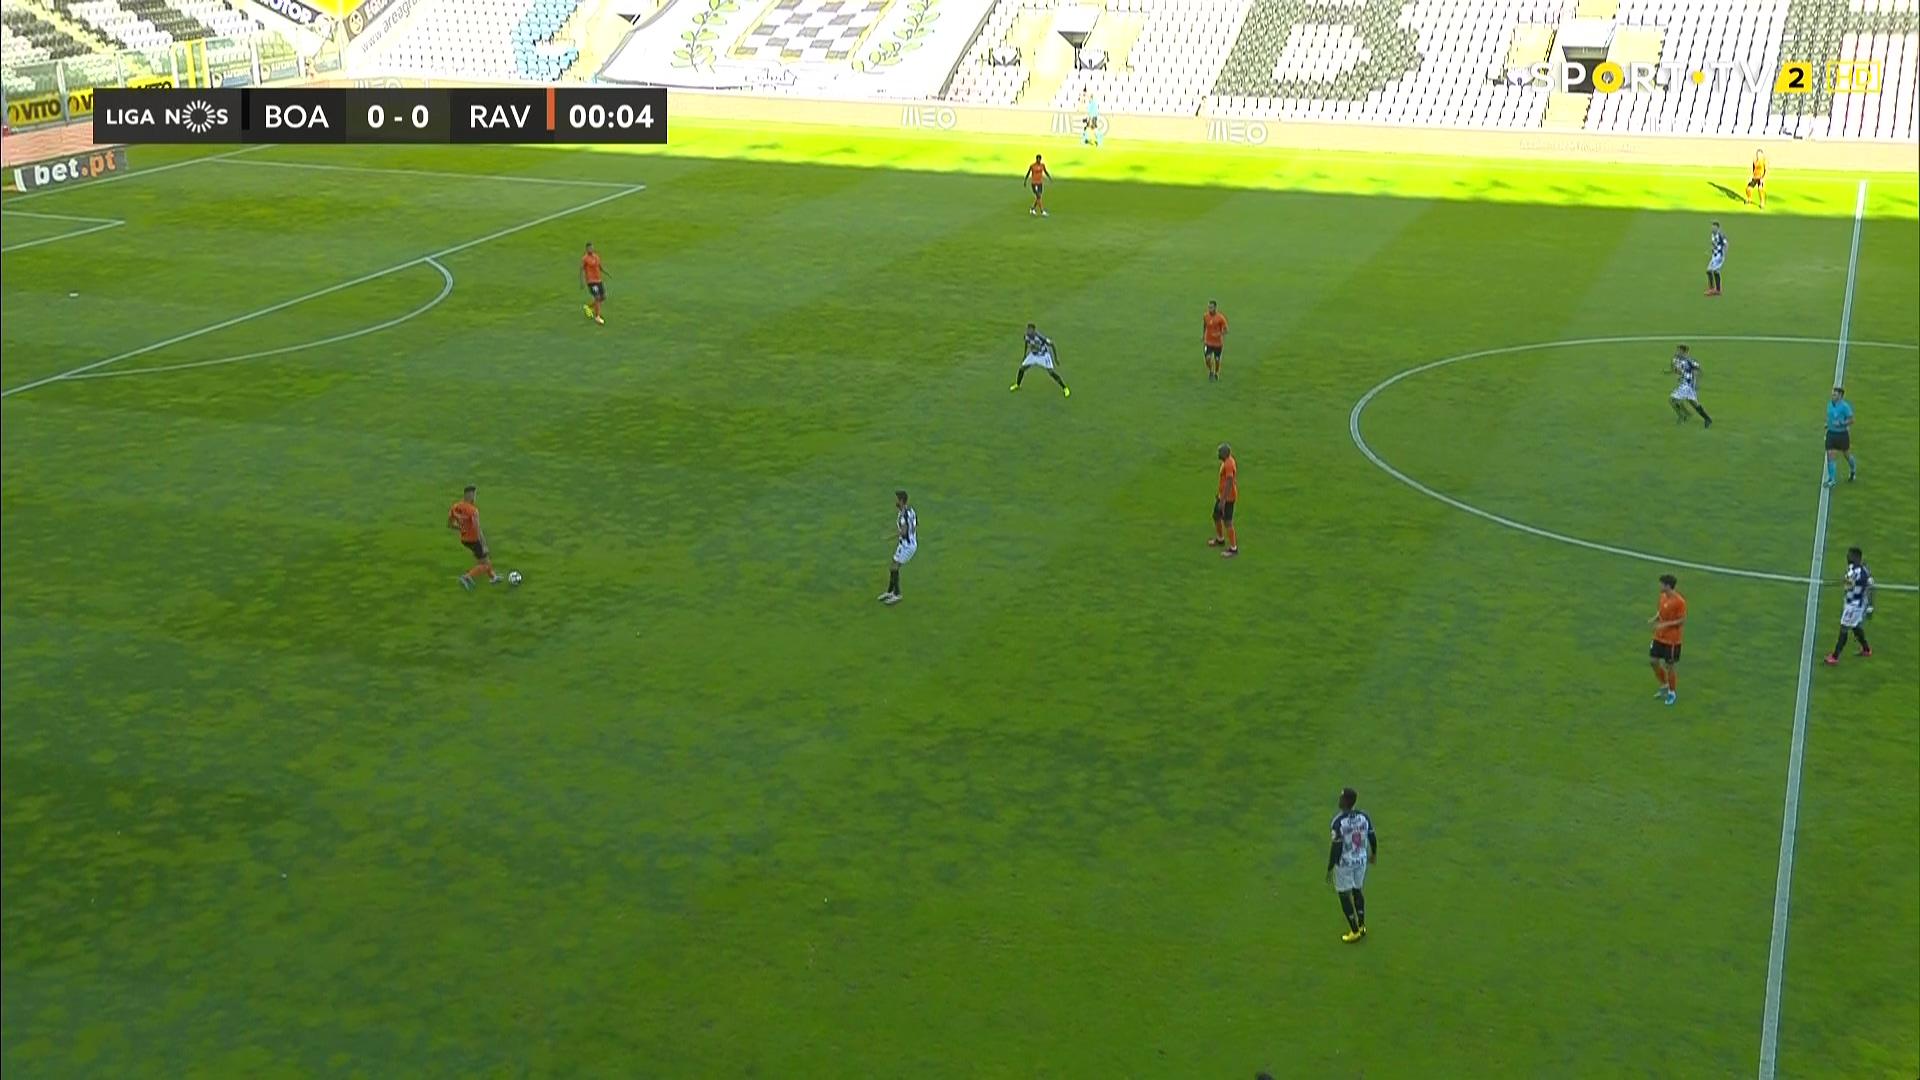 Portugal Liga NOS 19/20 - Boavista vs Rio Ave - 25/07/2020